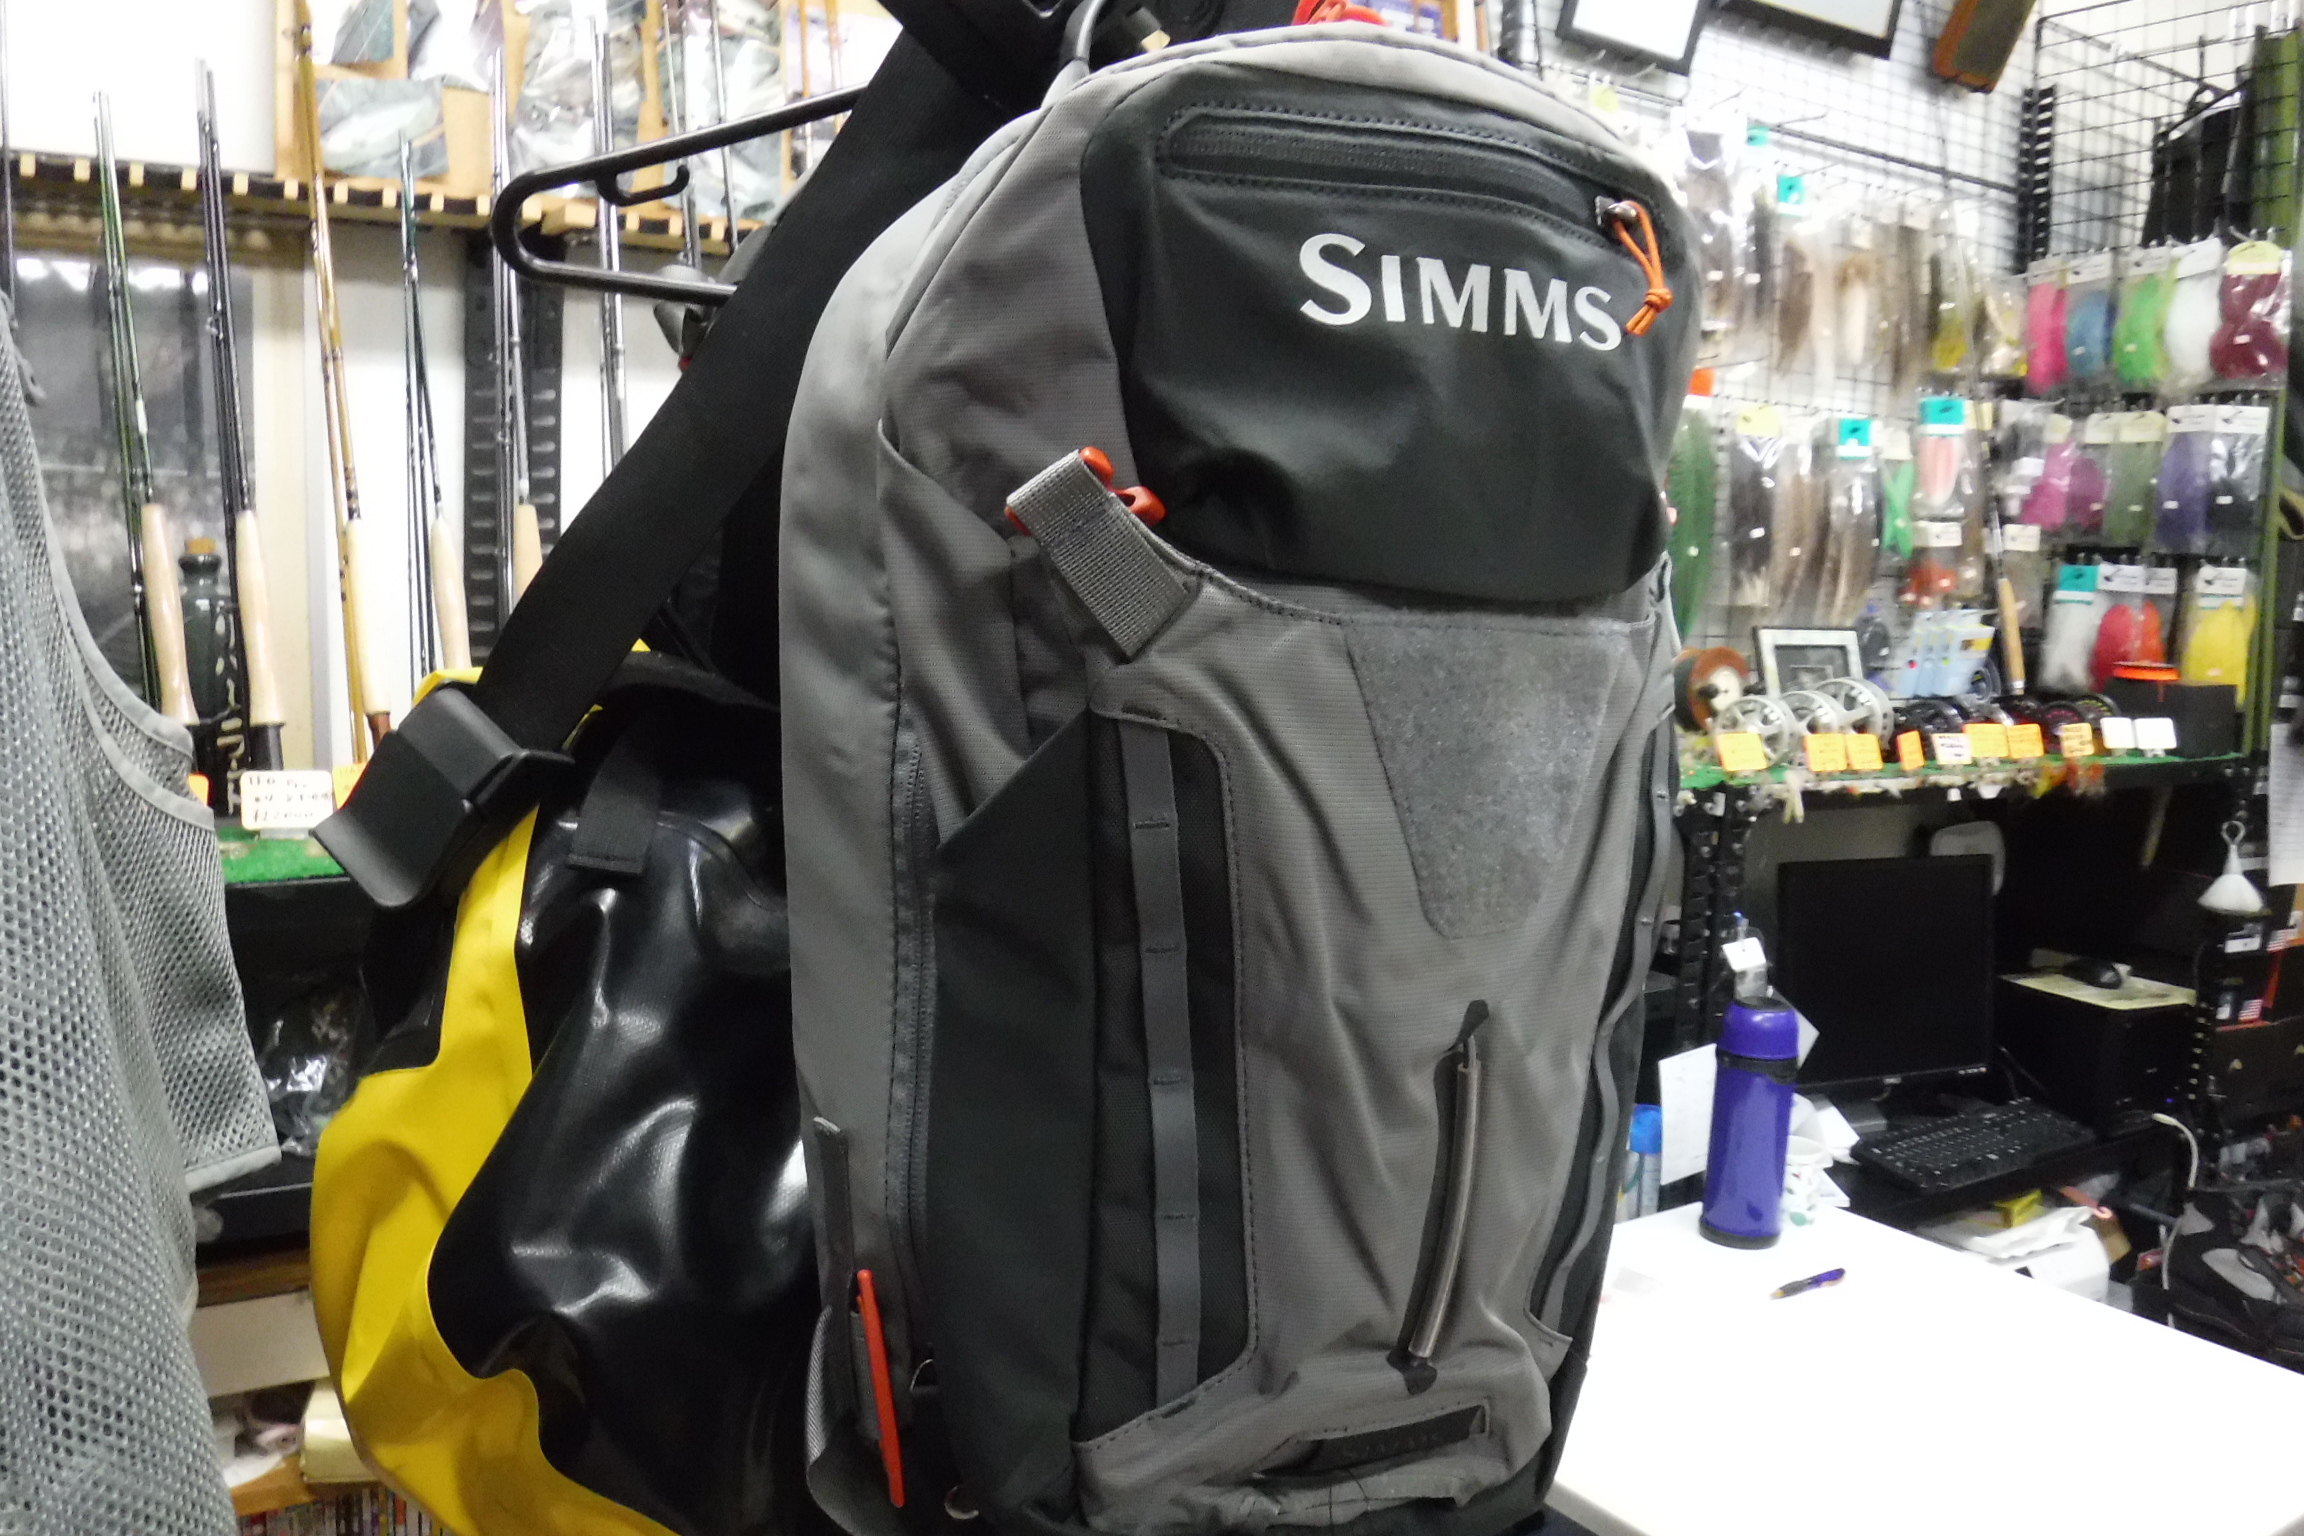 SIMMS FS AMBIDEXTROUS  SLING